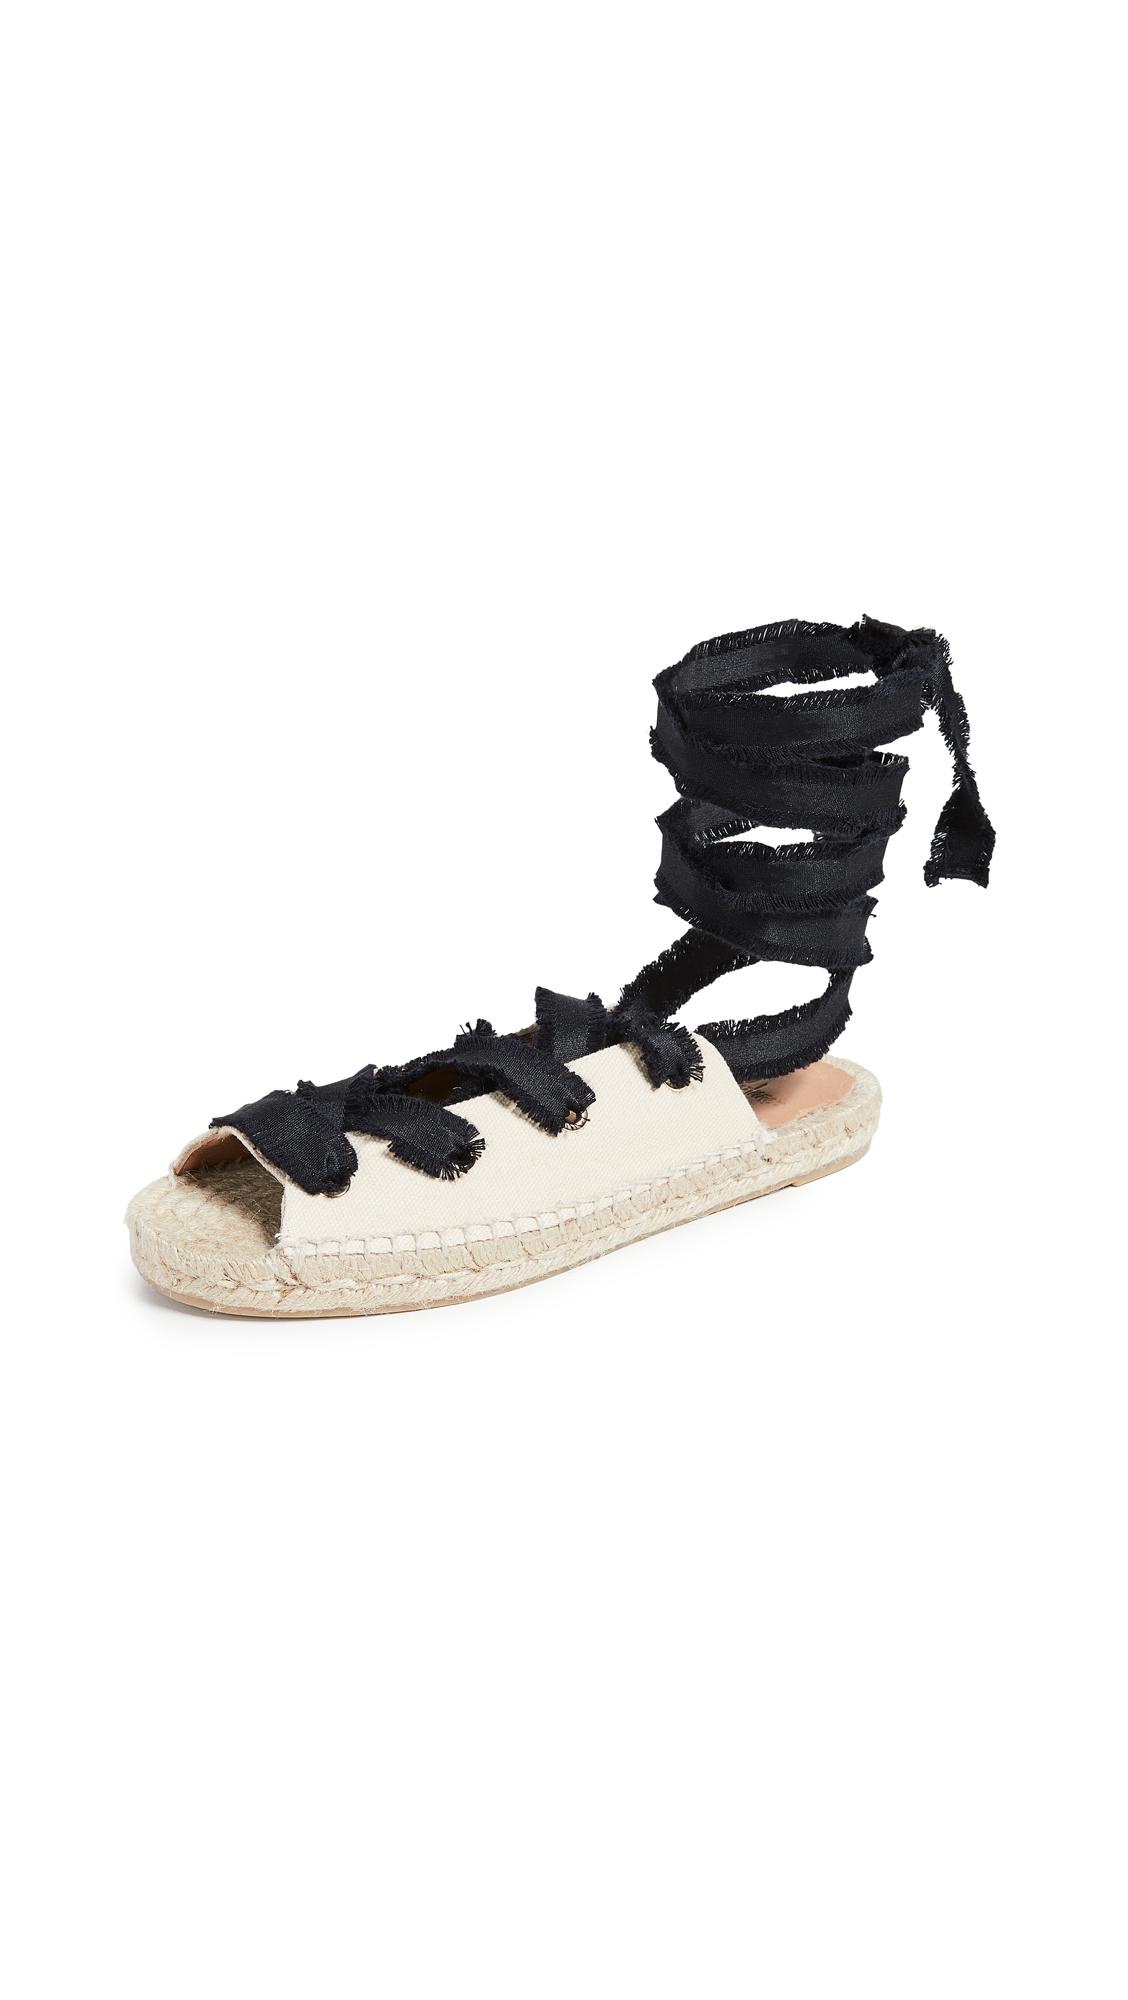 Castaner Pippa Flat Sandals - Ivory